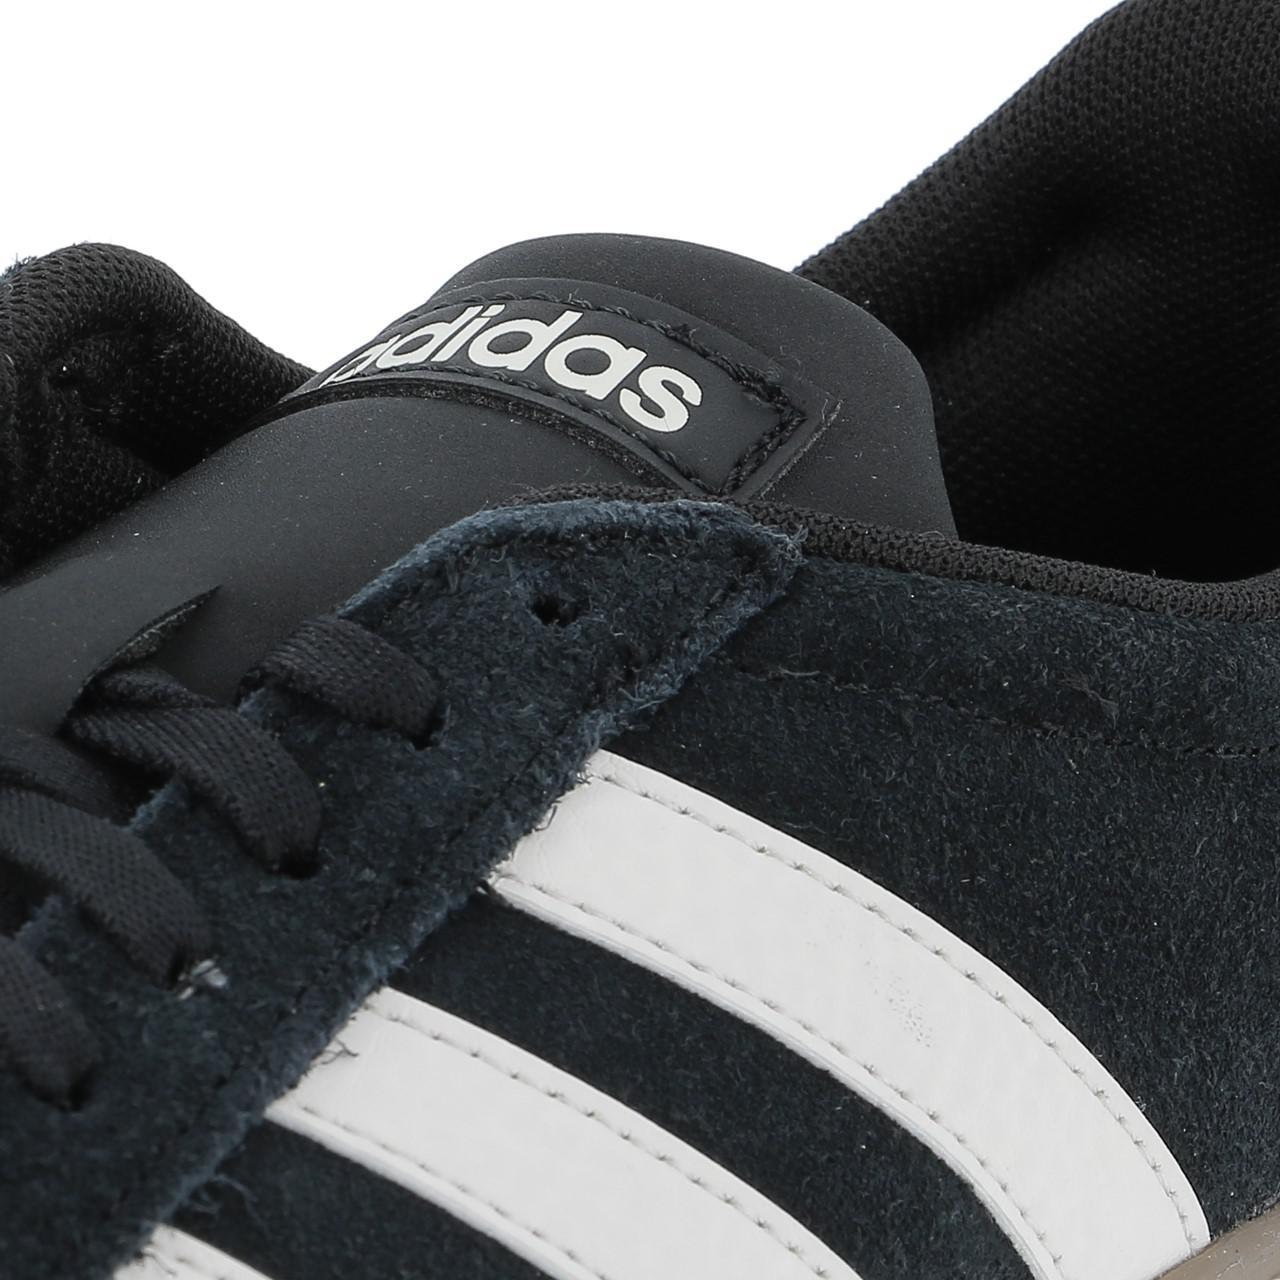 CHAUSSURES MODE VILLE Adidas Vl court 2.0 noir gomme Noir